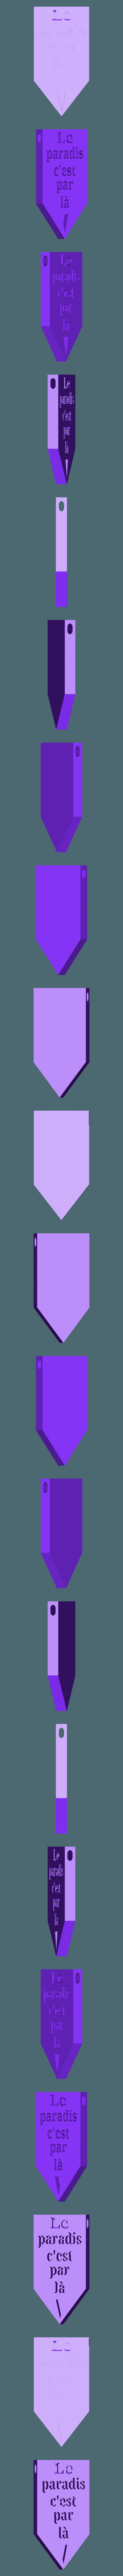 pendentif 3.stl Download STL file pendant • 3D printer design, 3D-XYZ